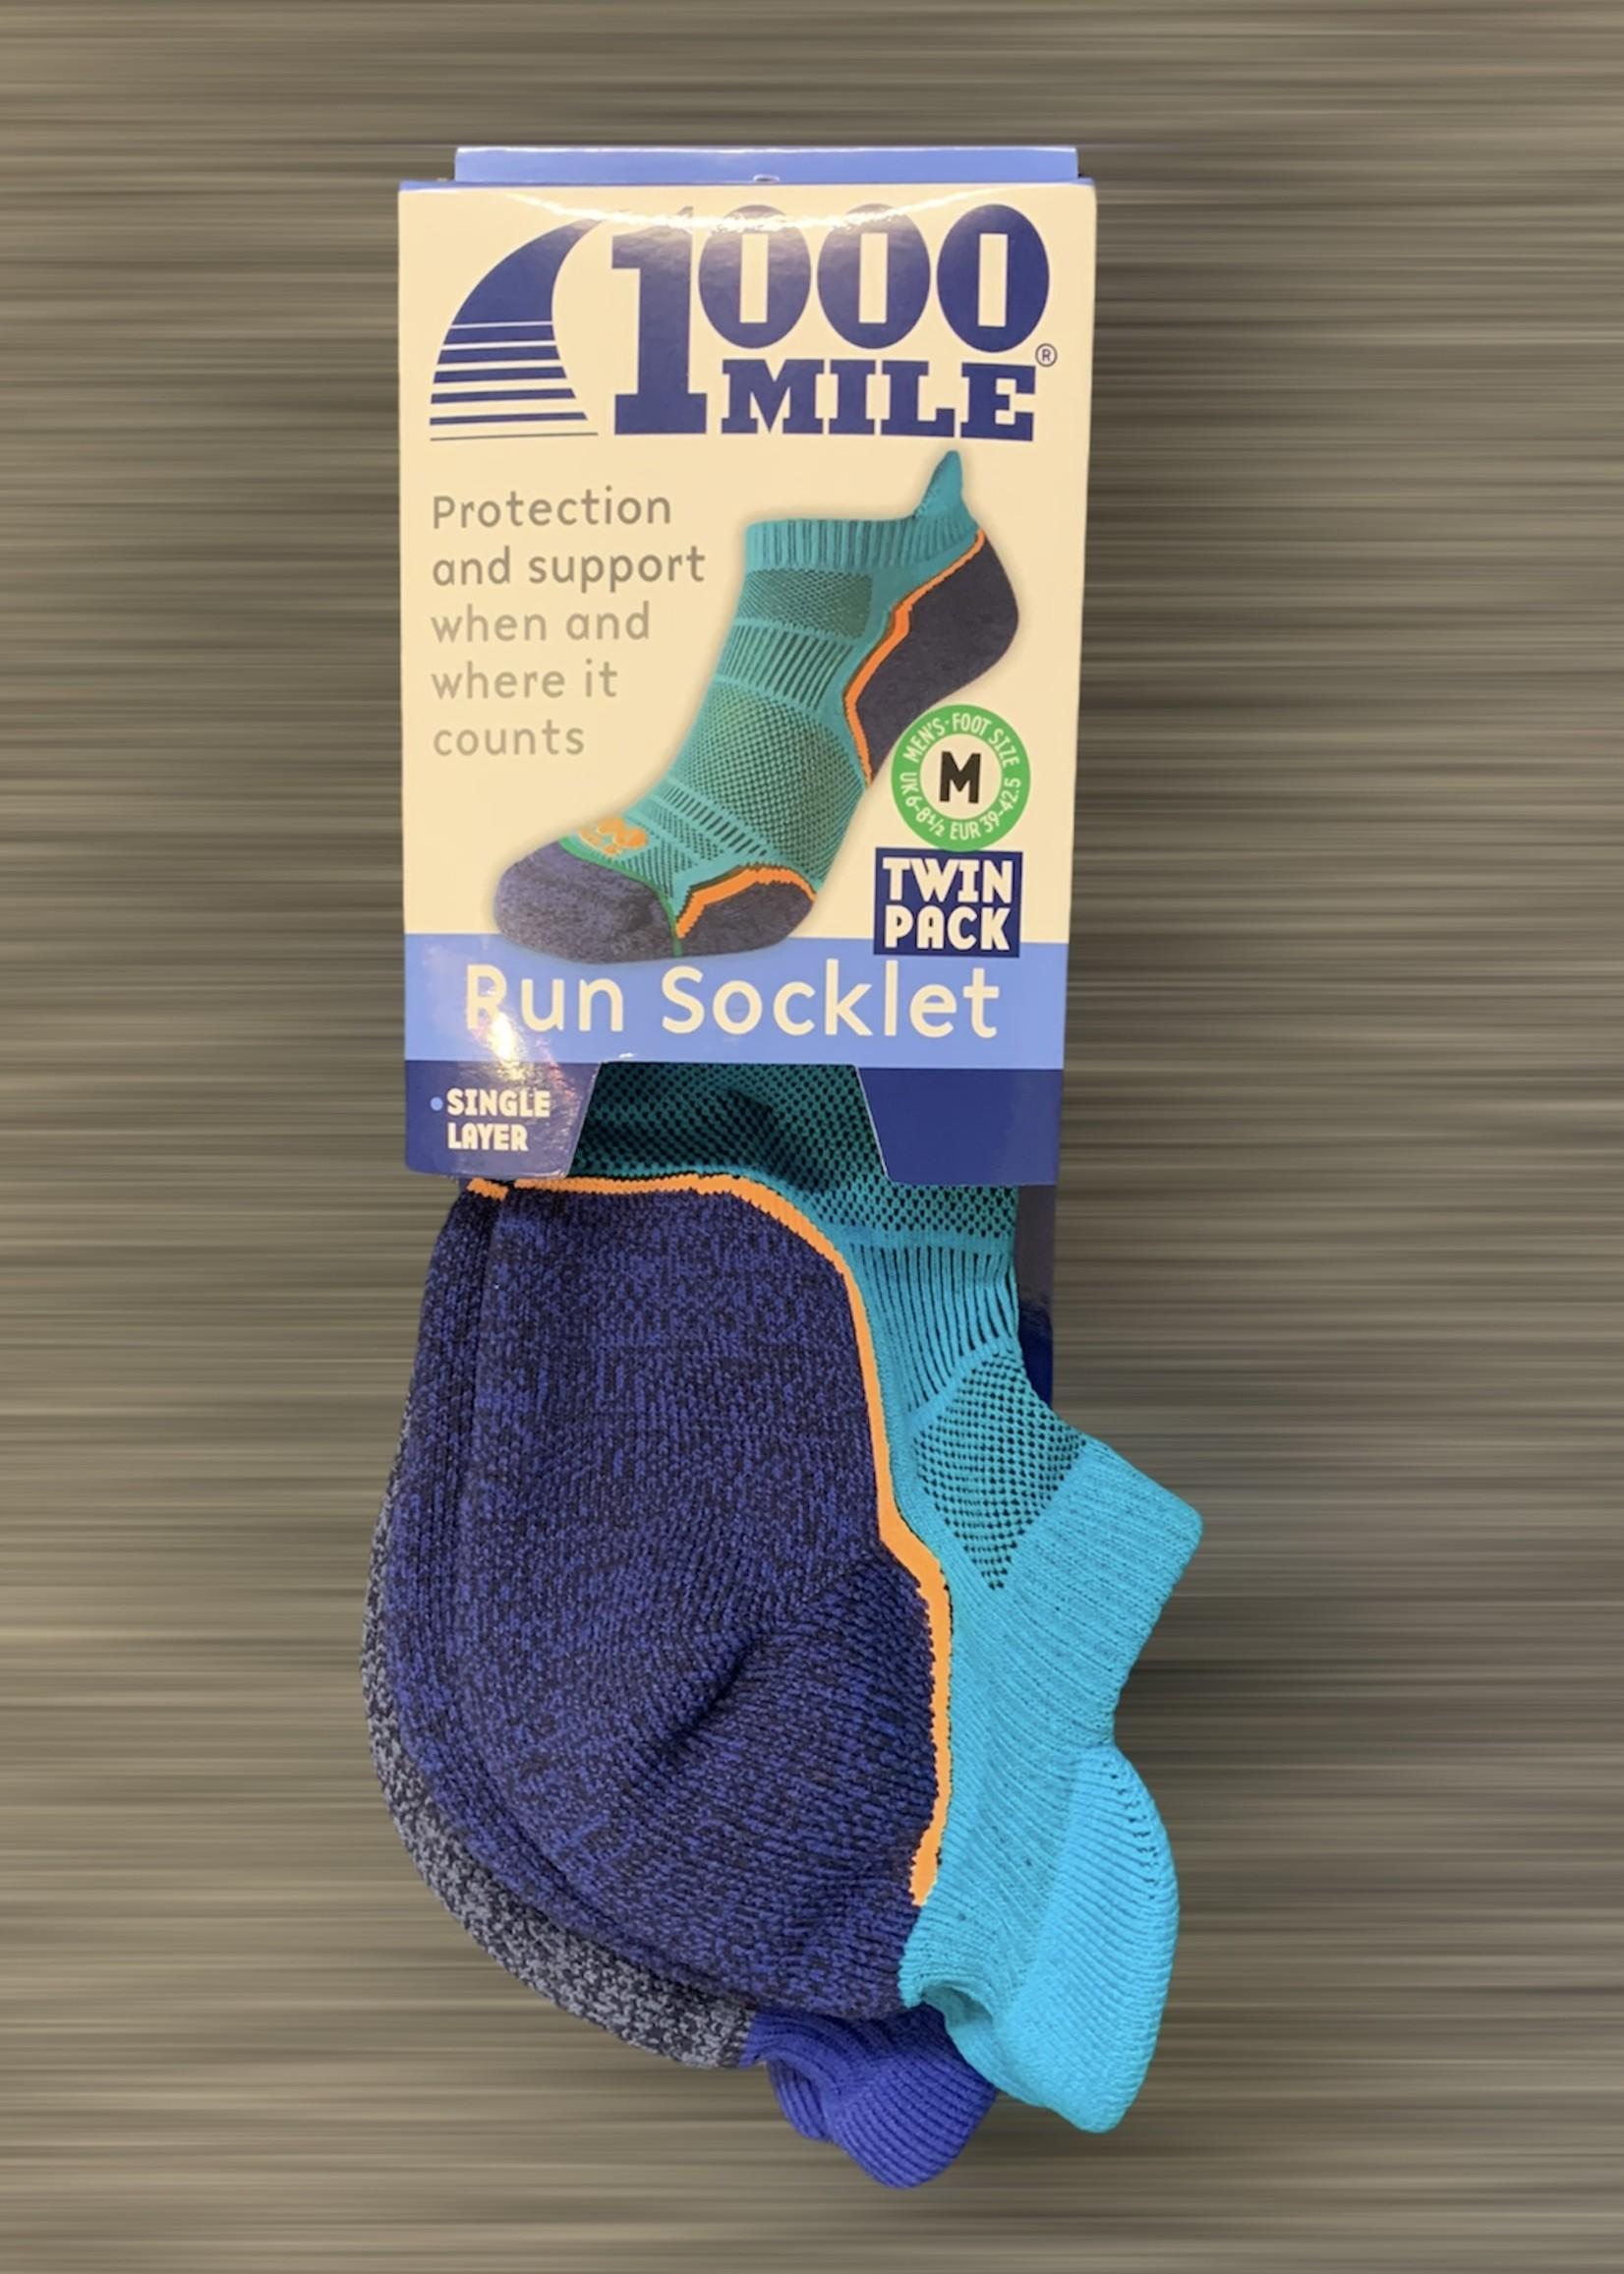 1000 mile 1000 Mile Run Socklet Twin Pack - Mens